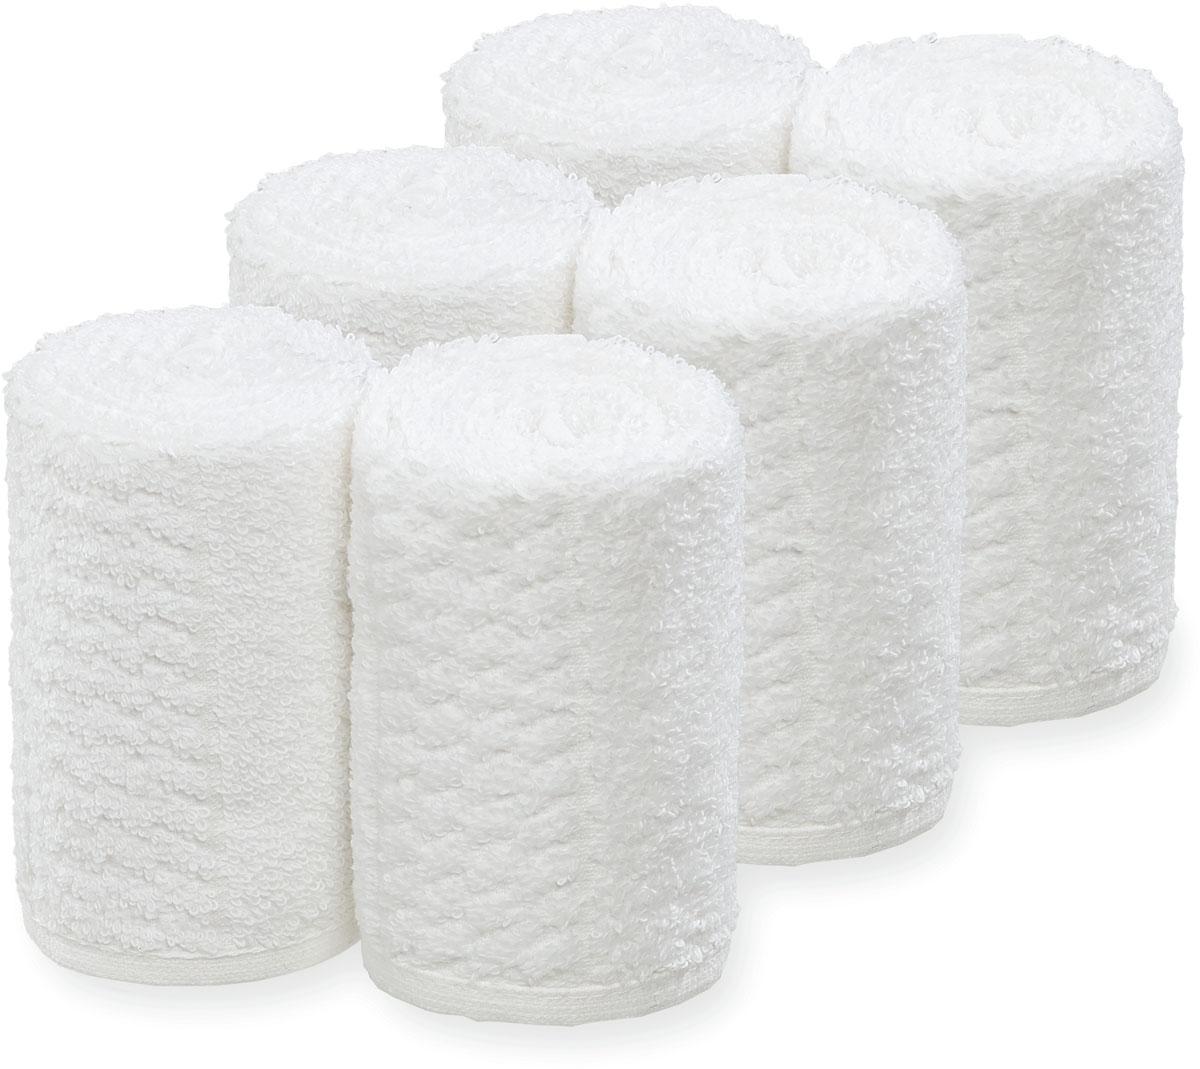 Barburys Take Care Handtücher-Gesichtstücher 6Stk / Weiss SN-3500261